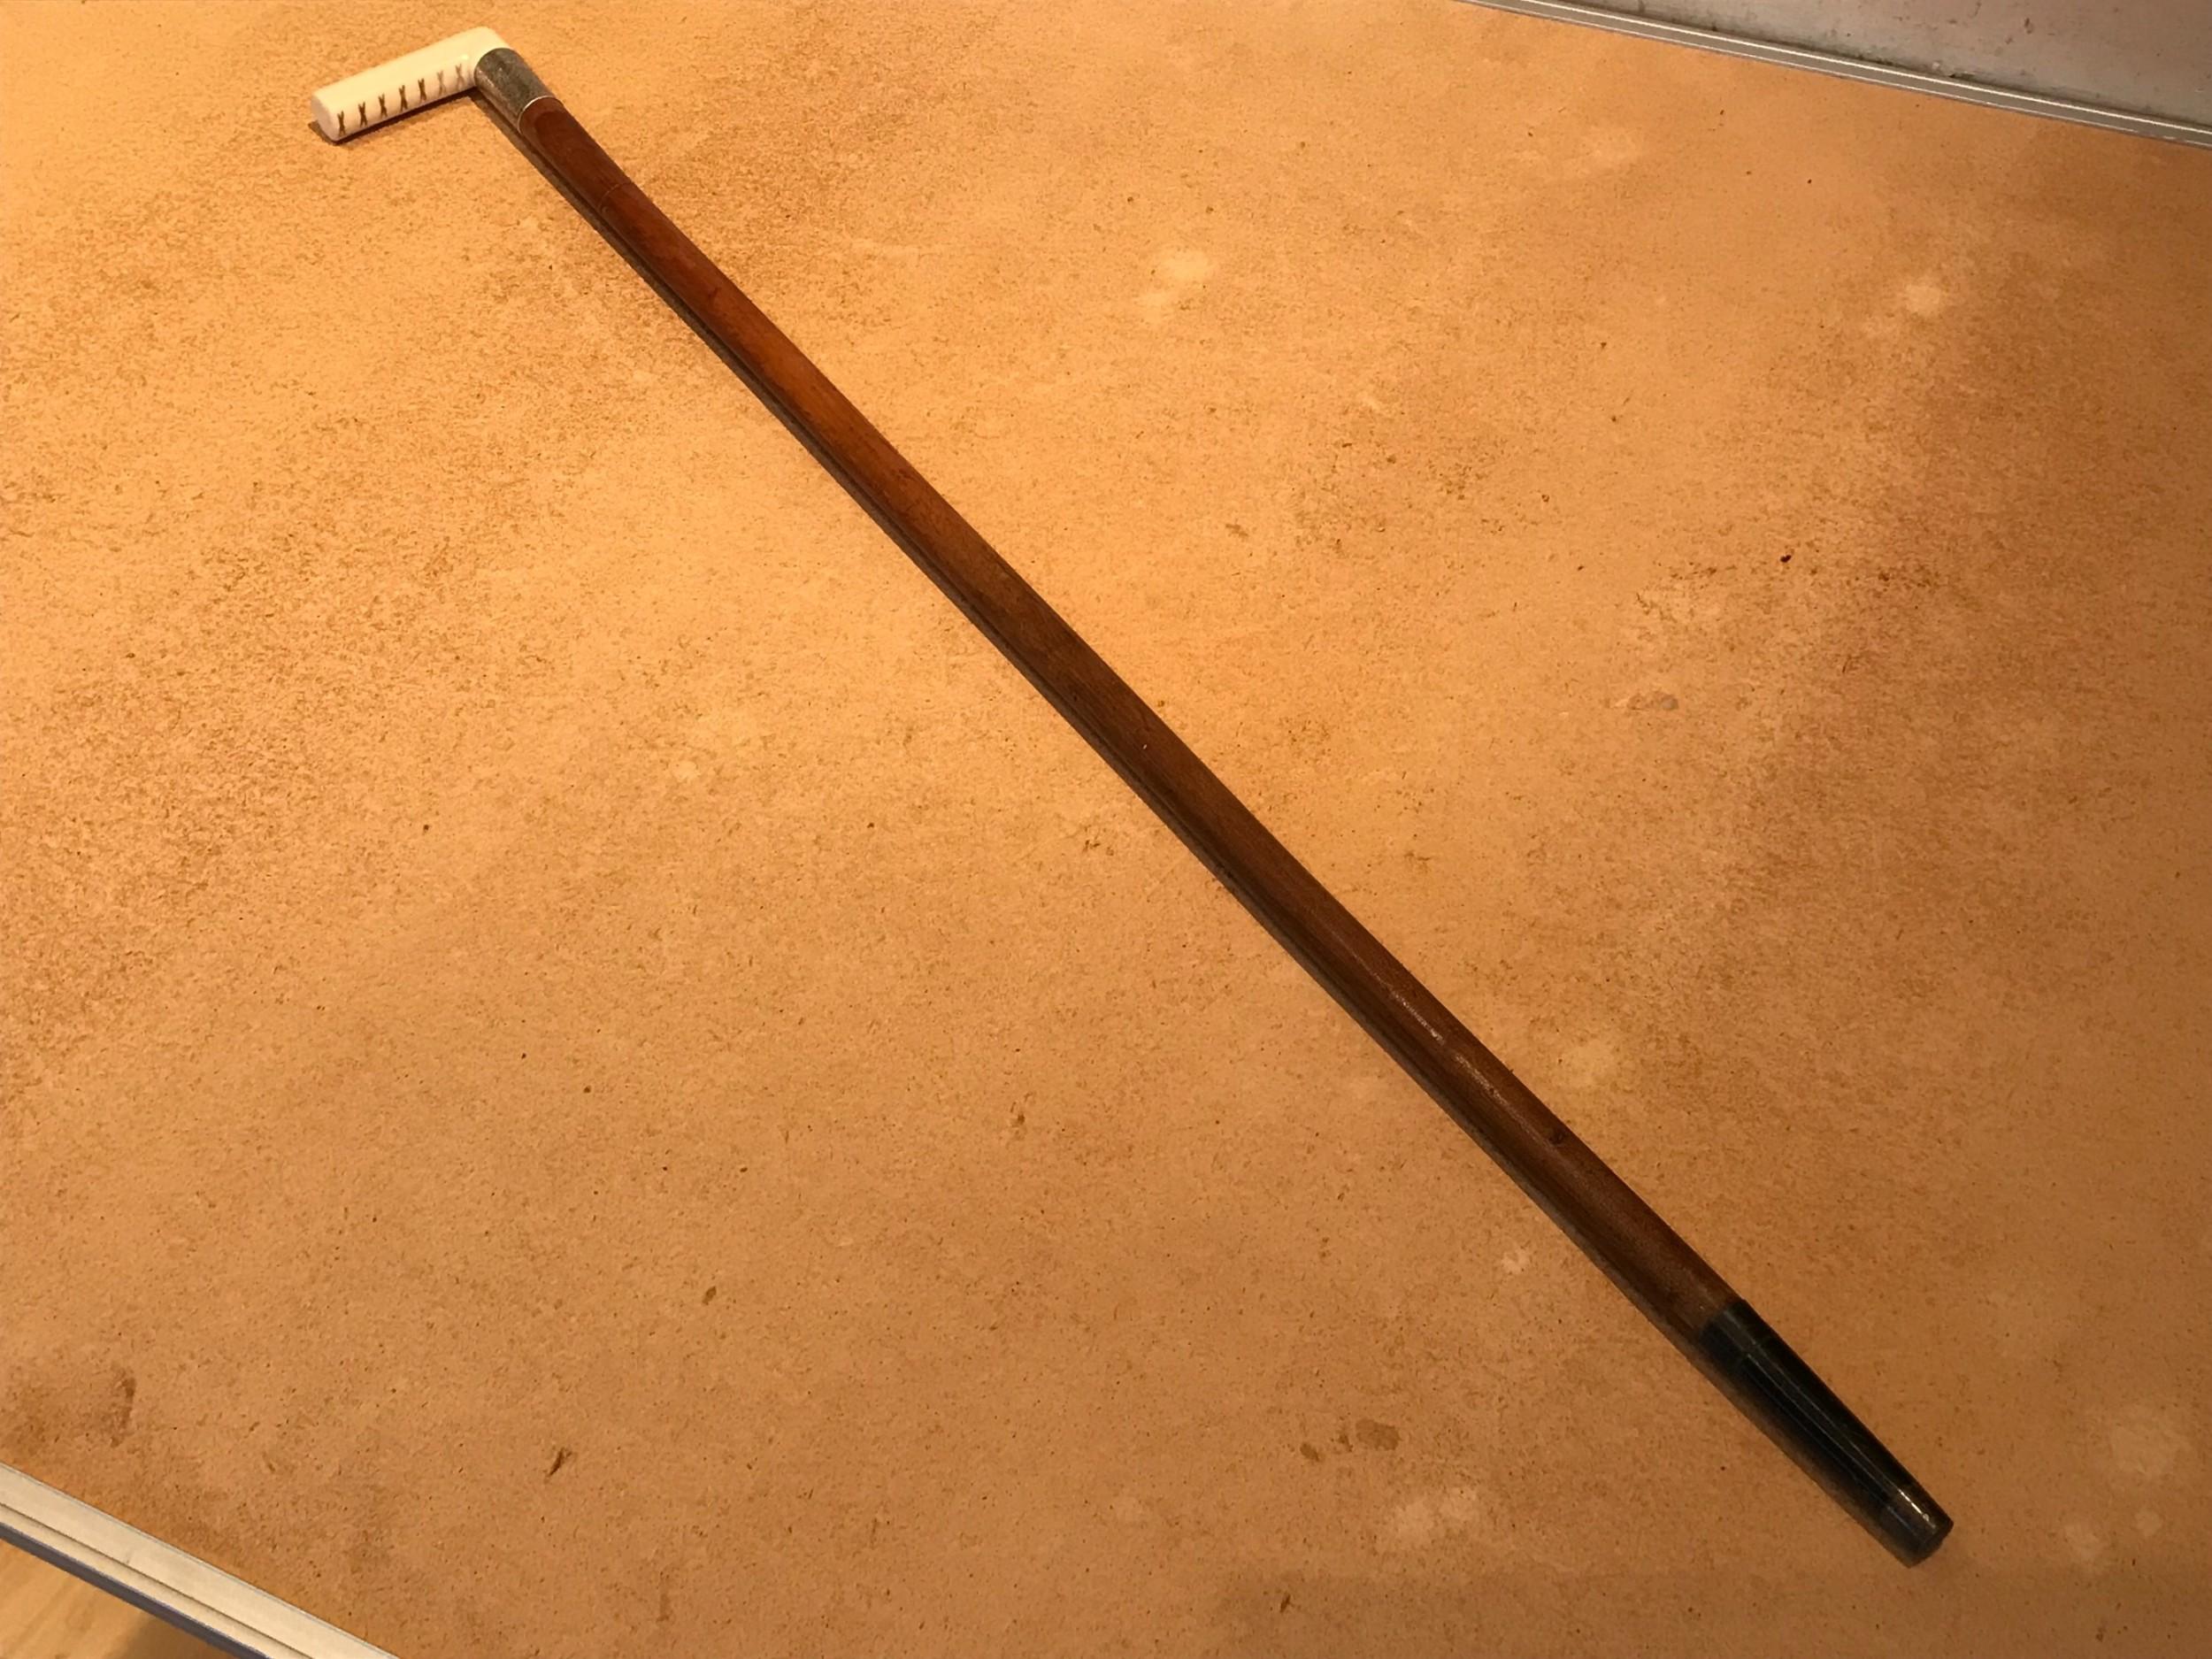 ivory handled silver mount walking sword stick